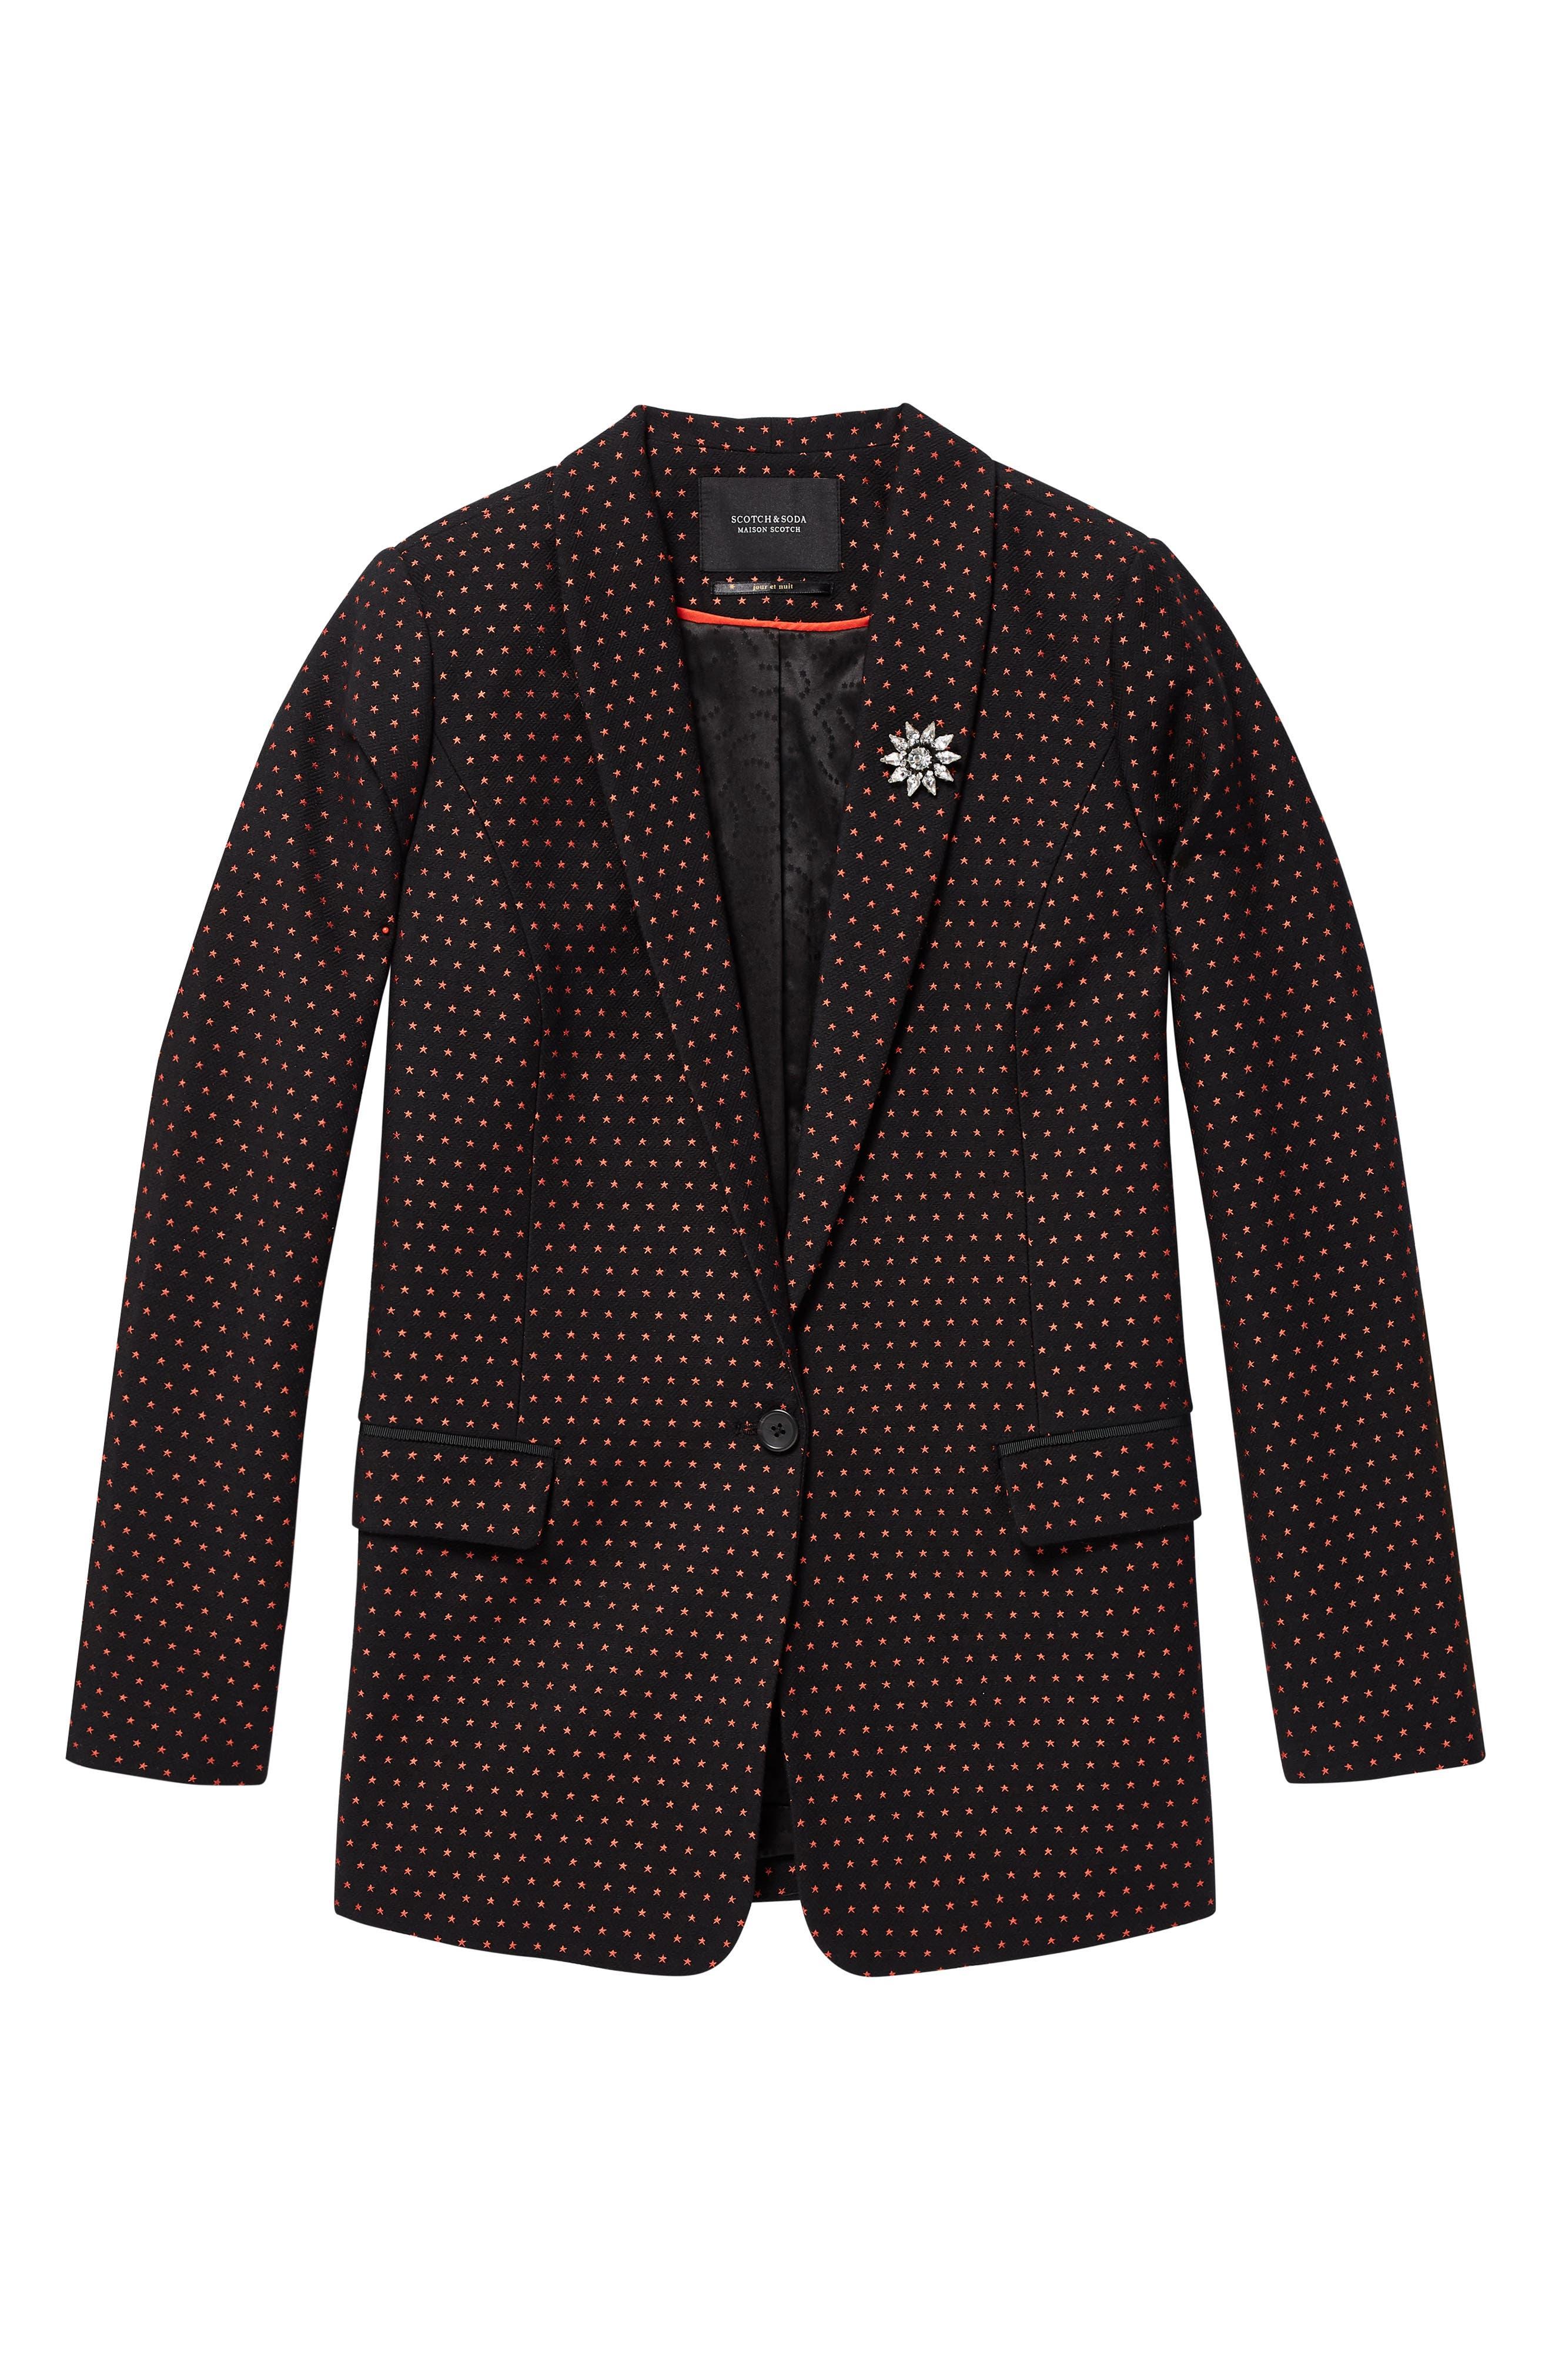 SCOTCH & SODA,                             Tailored Stretch Jacquard Blazer,                             Alternate thumbnail 3, color,                             BLACK W/ SMALL STAR PRINT